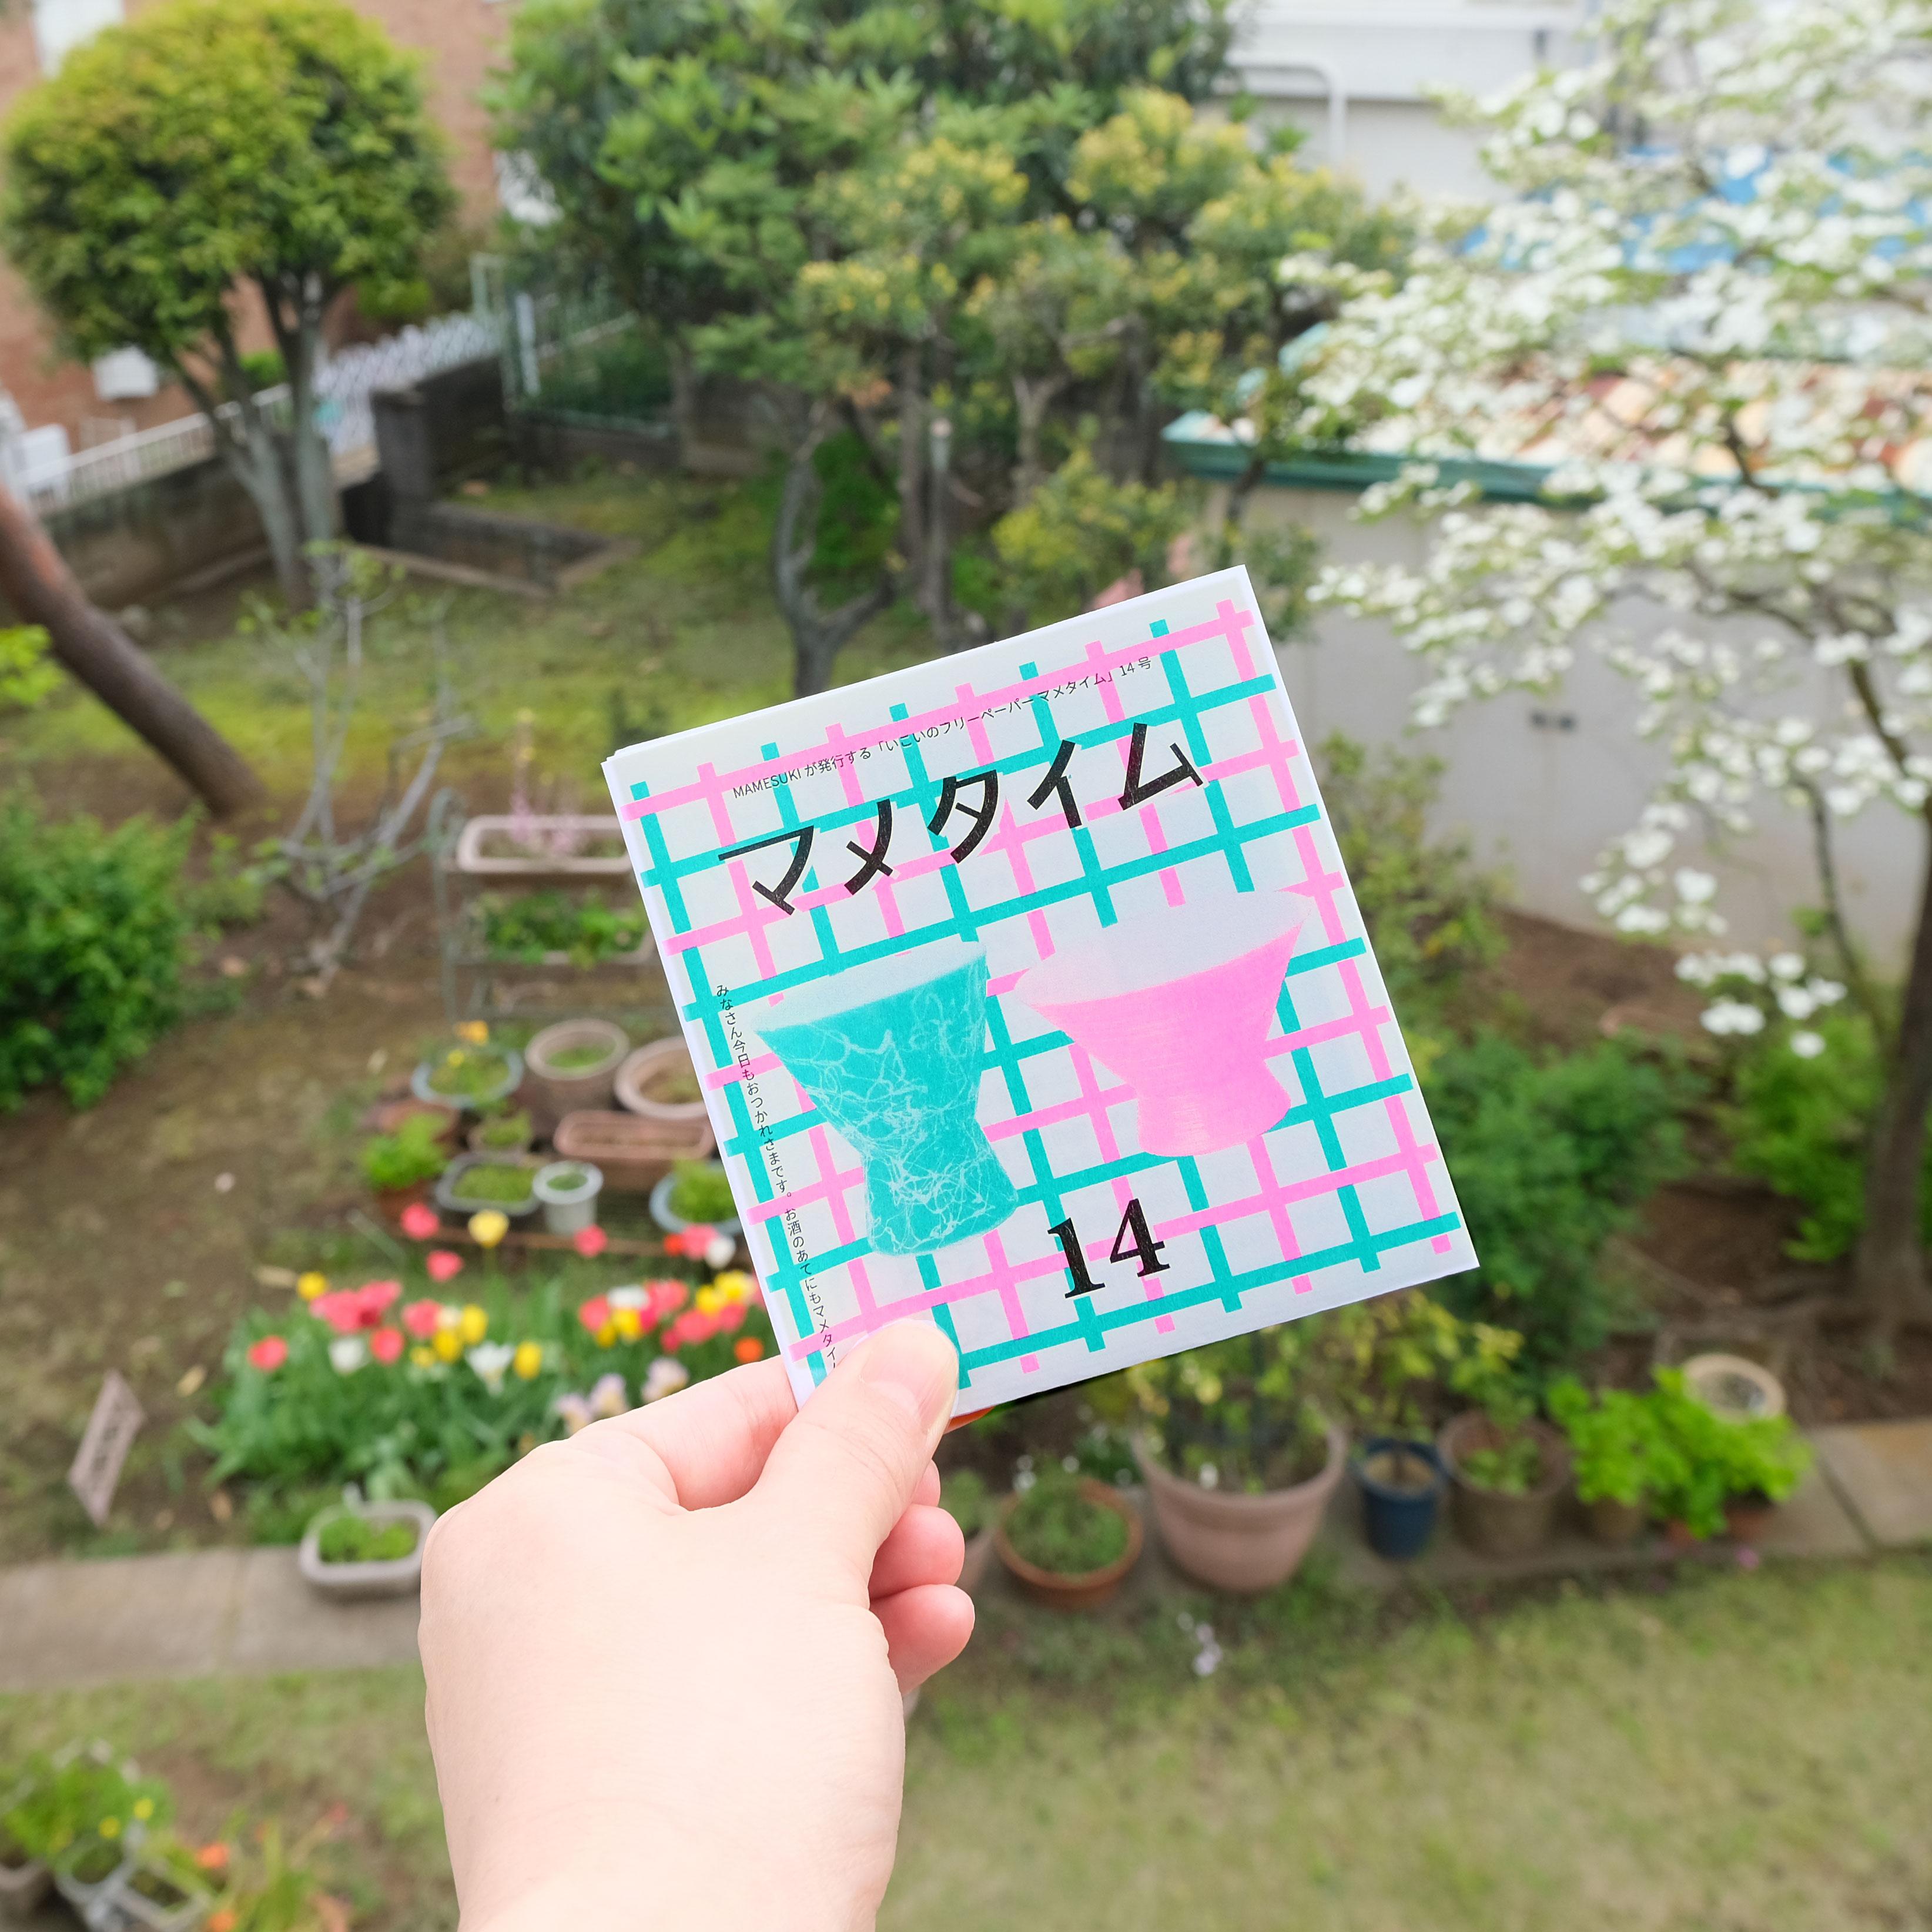 MAMESUKIのフリペーパー「いこいのフリーペーパー マメタイム」14号を発行しました